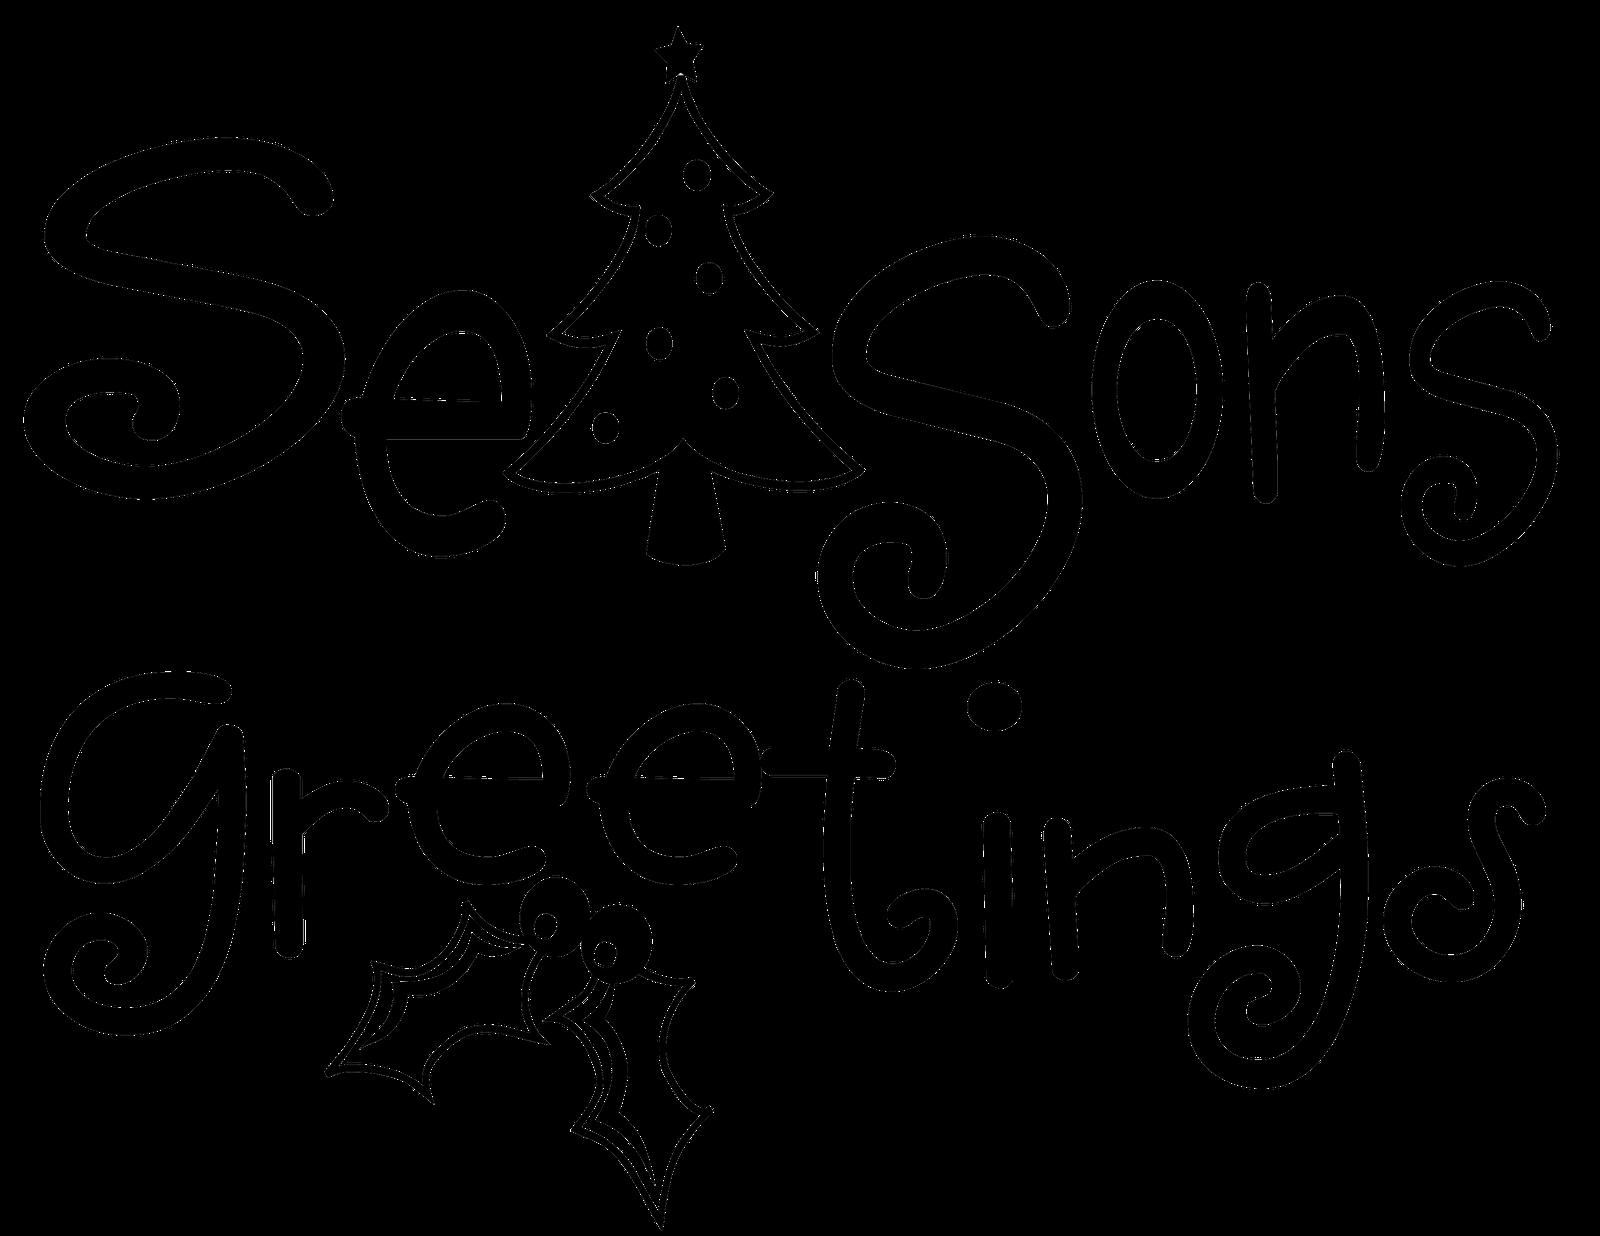 Words clipart seasons. Mudmaven designs monday freebie